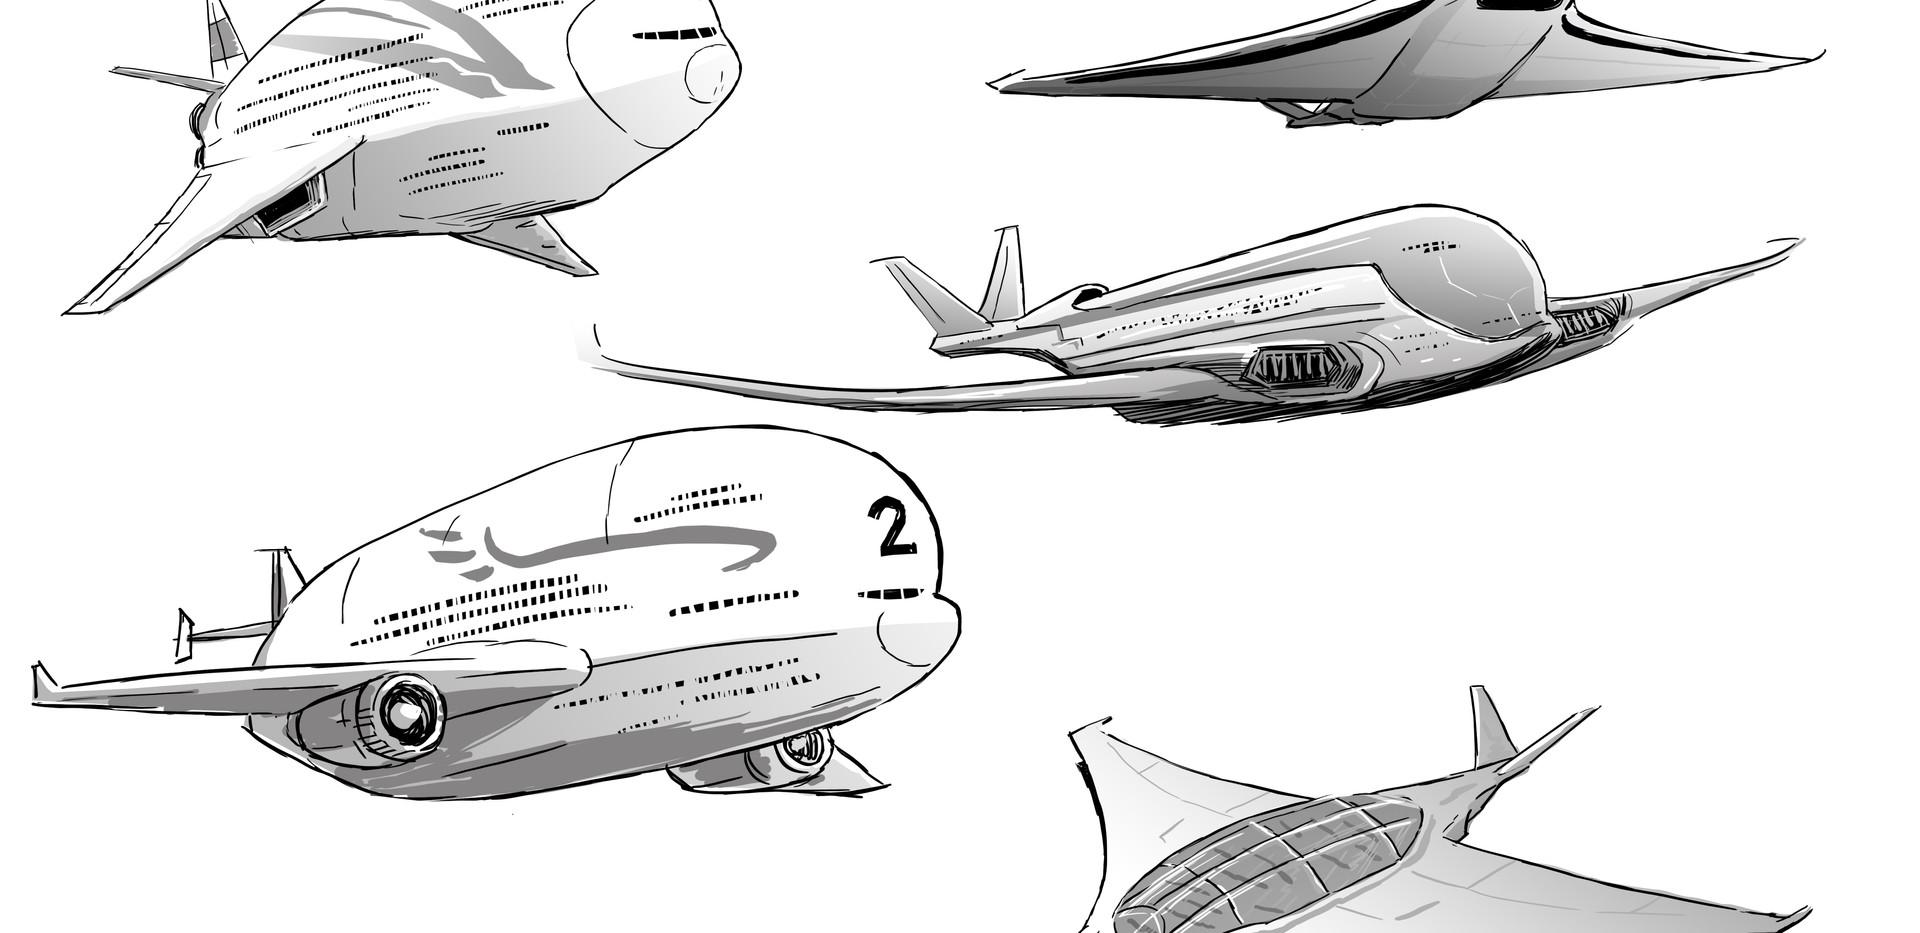 Aircraft concep art